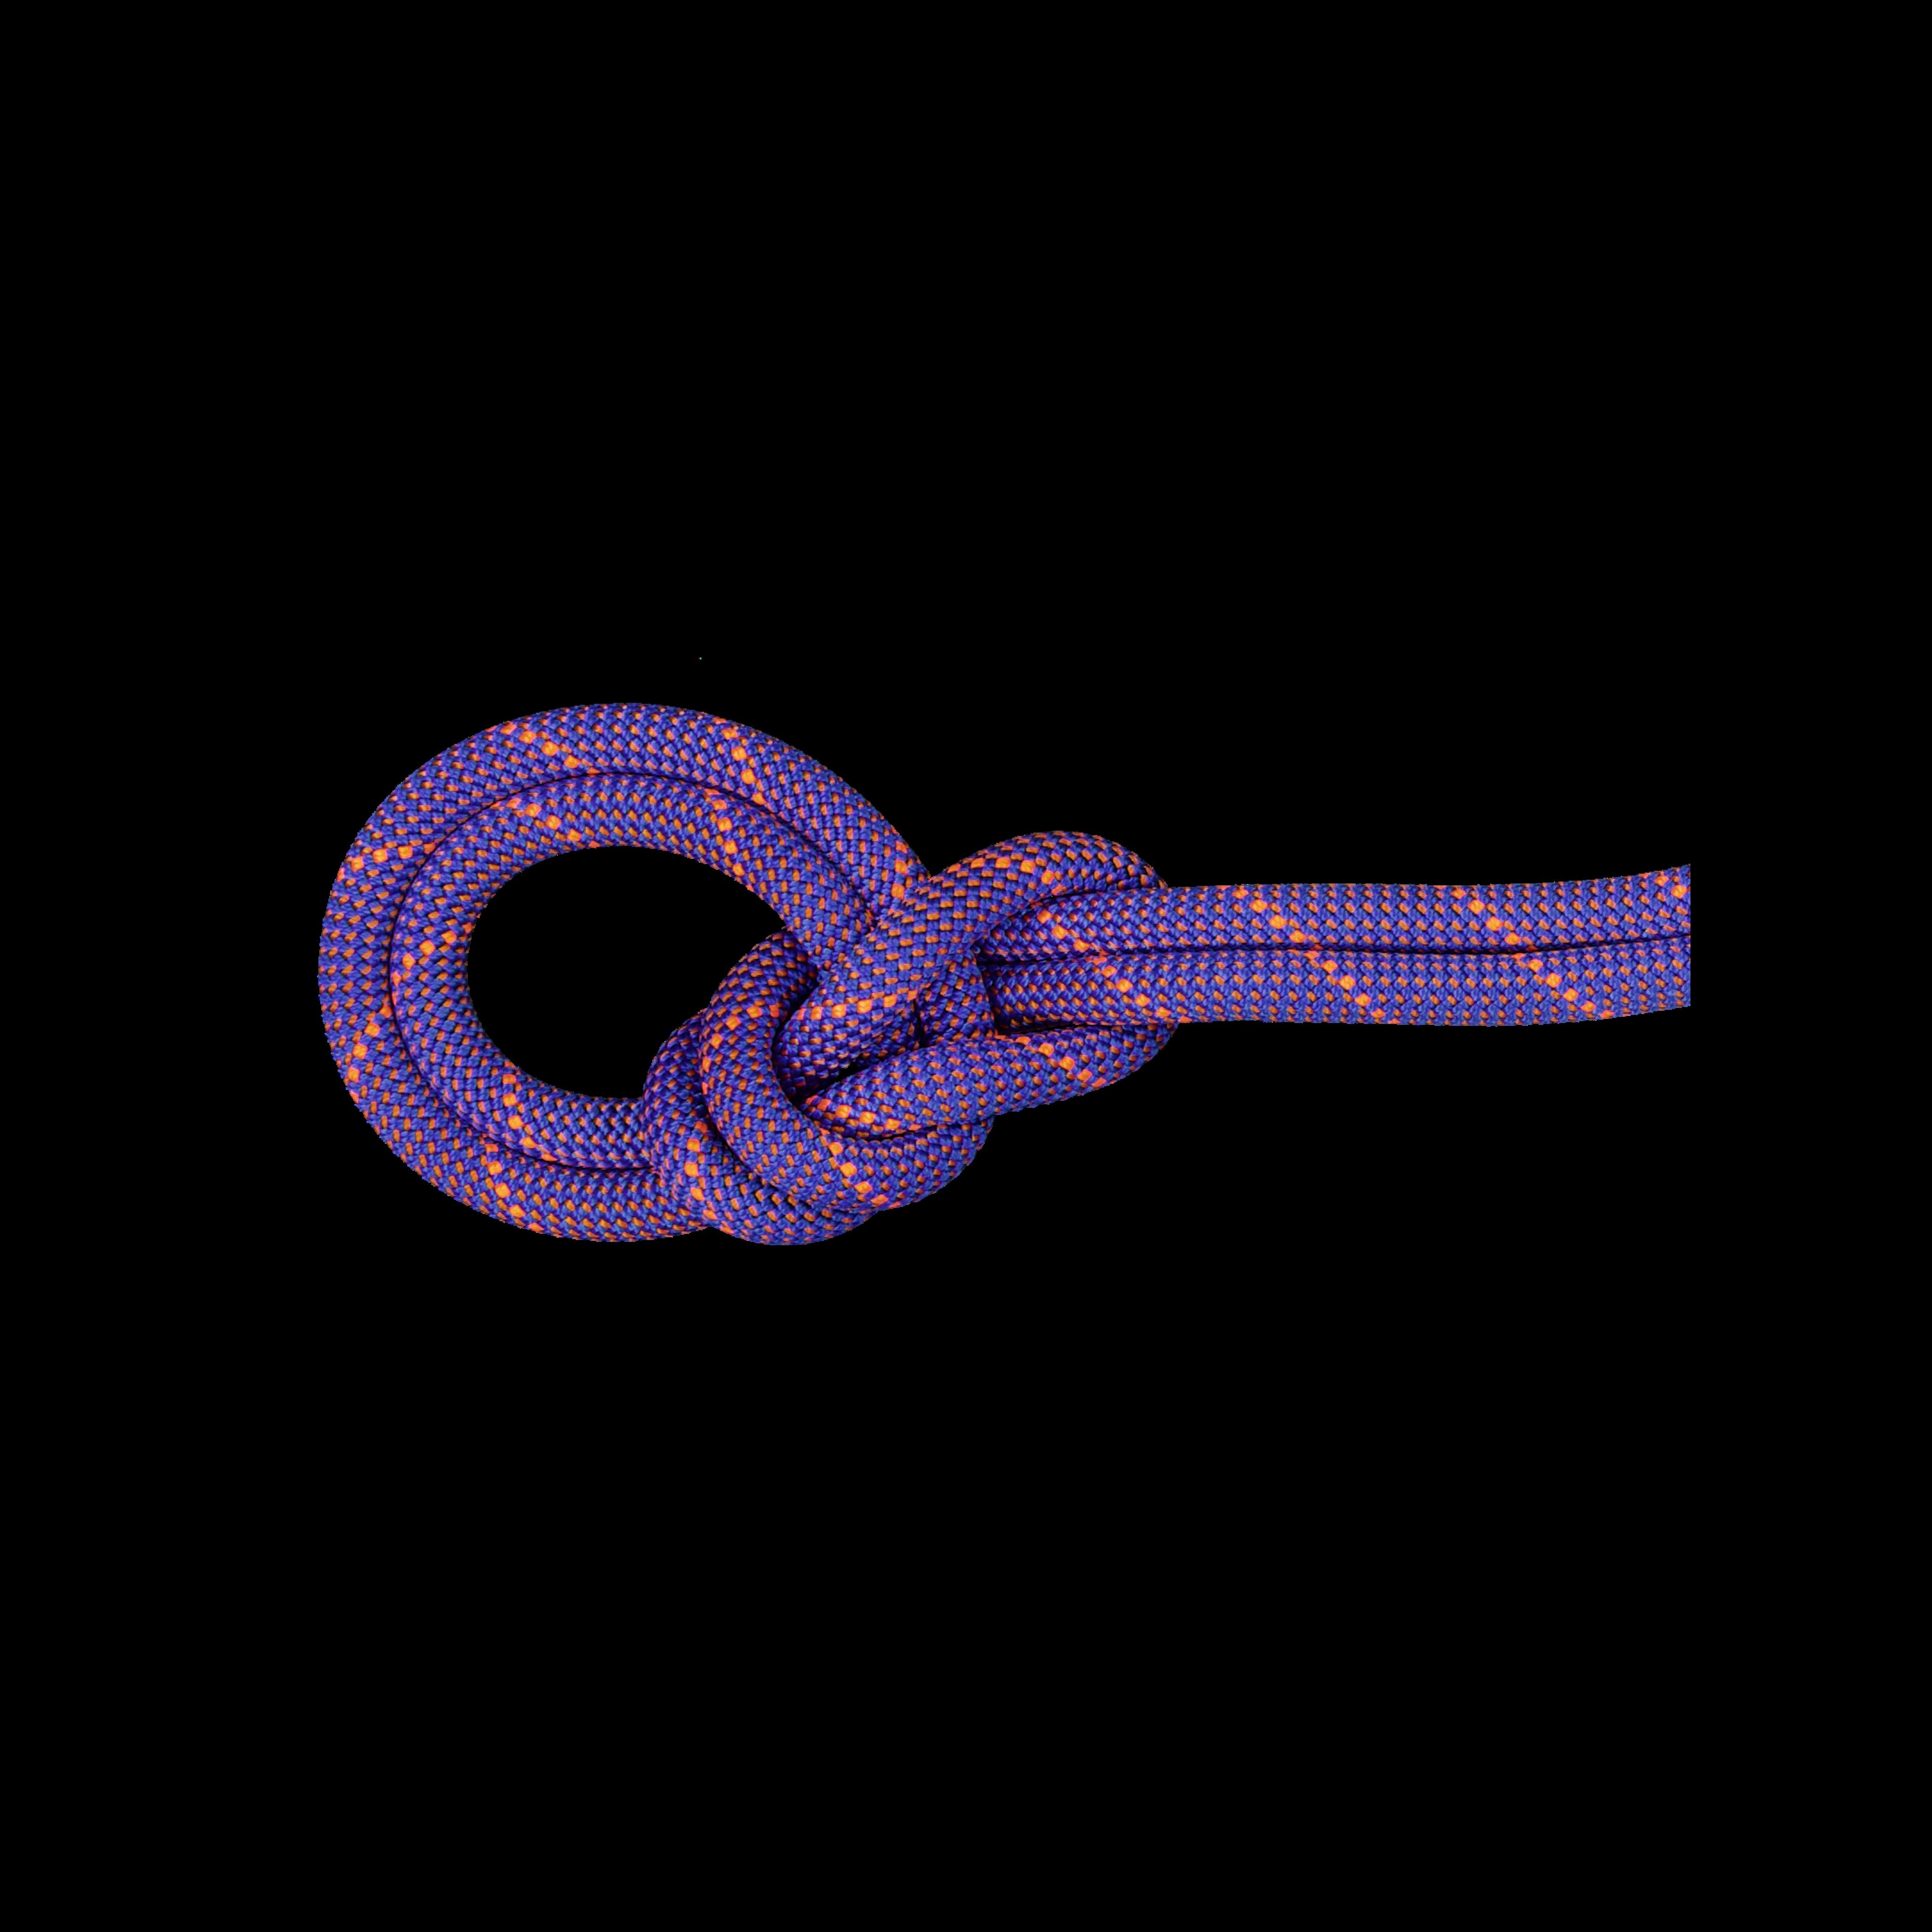 9.0 Crag Sender Dry Rope product image